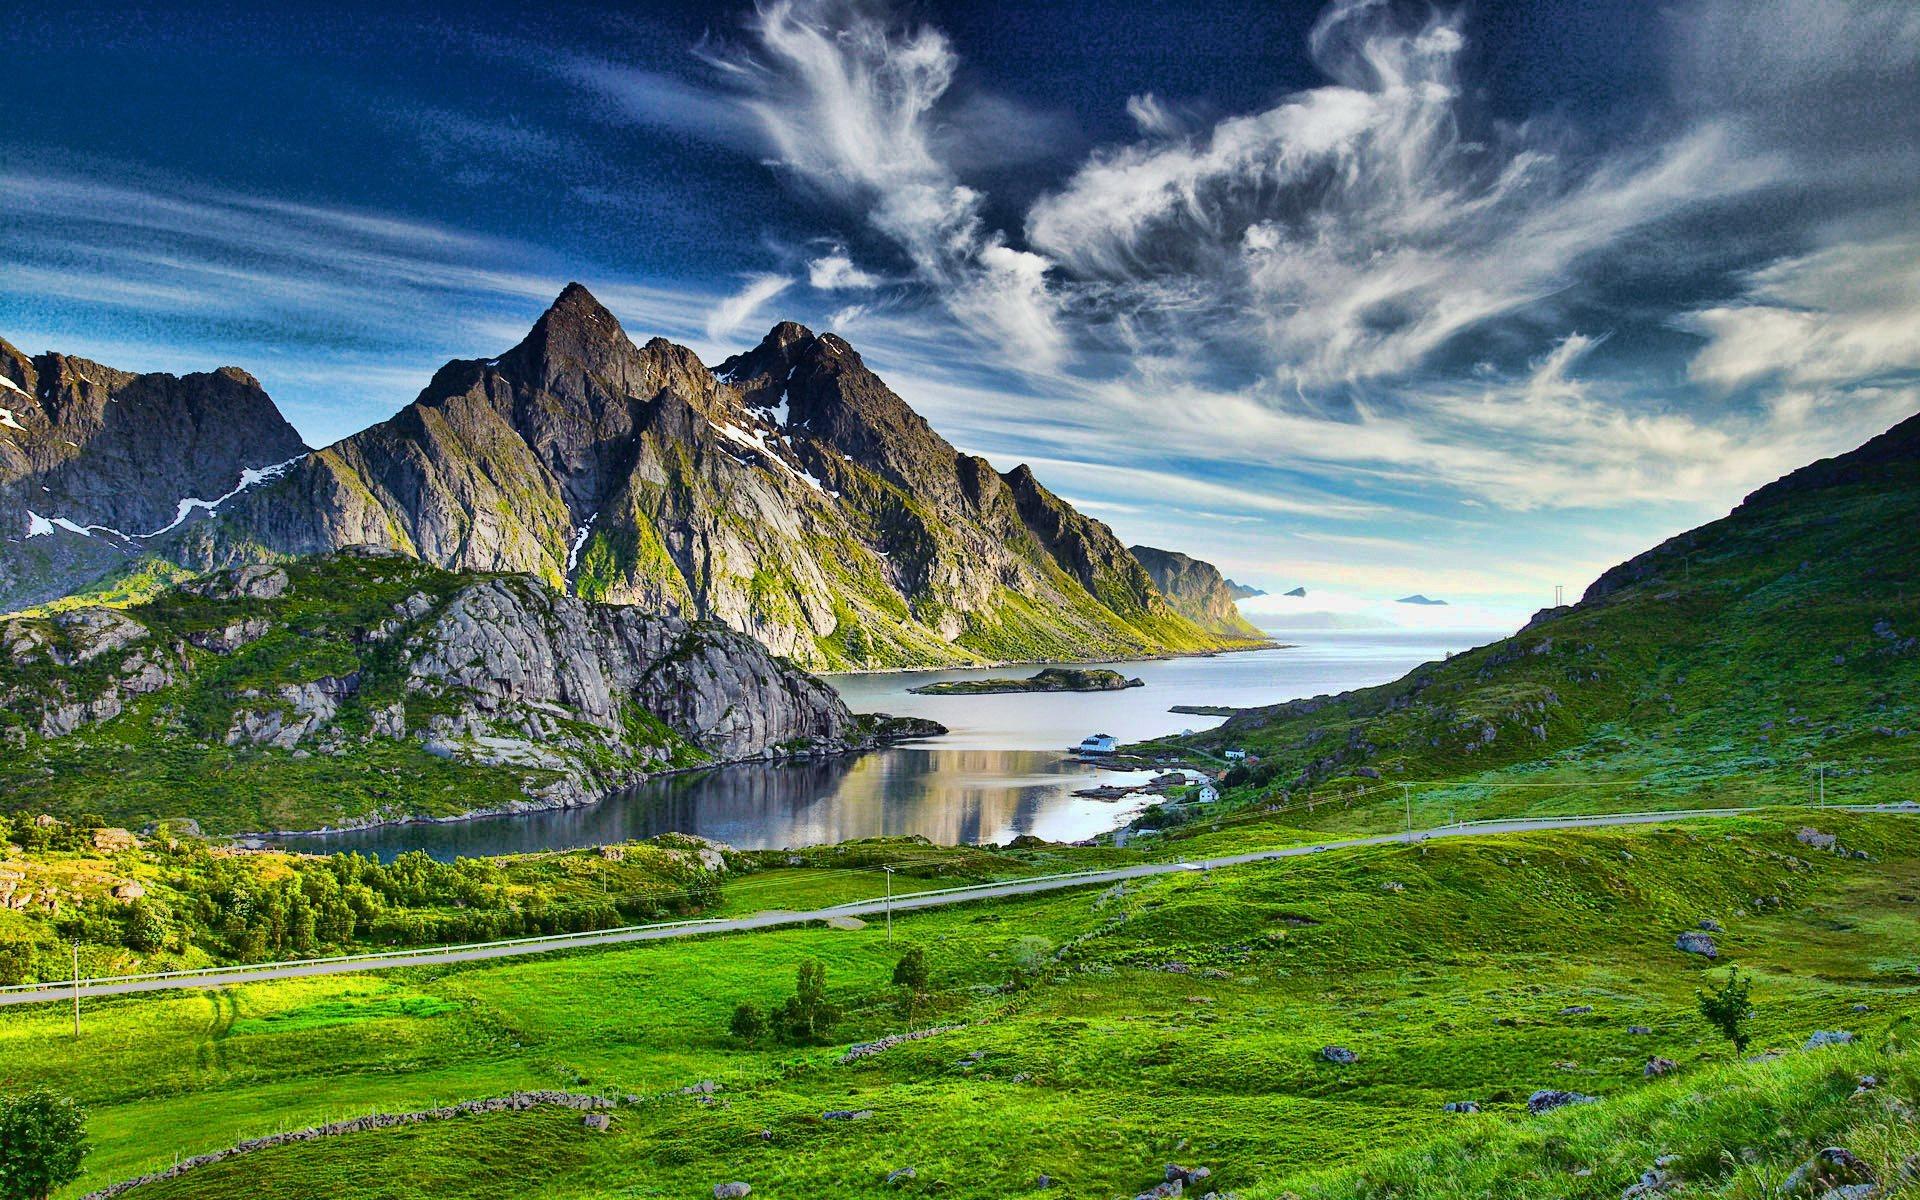 Warm Green Landscape Mountains Wallpaper 1920x1200